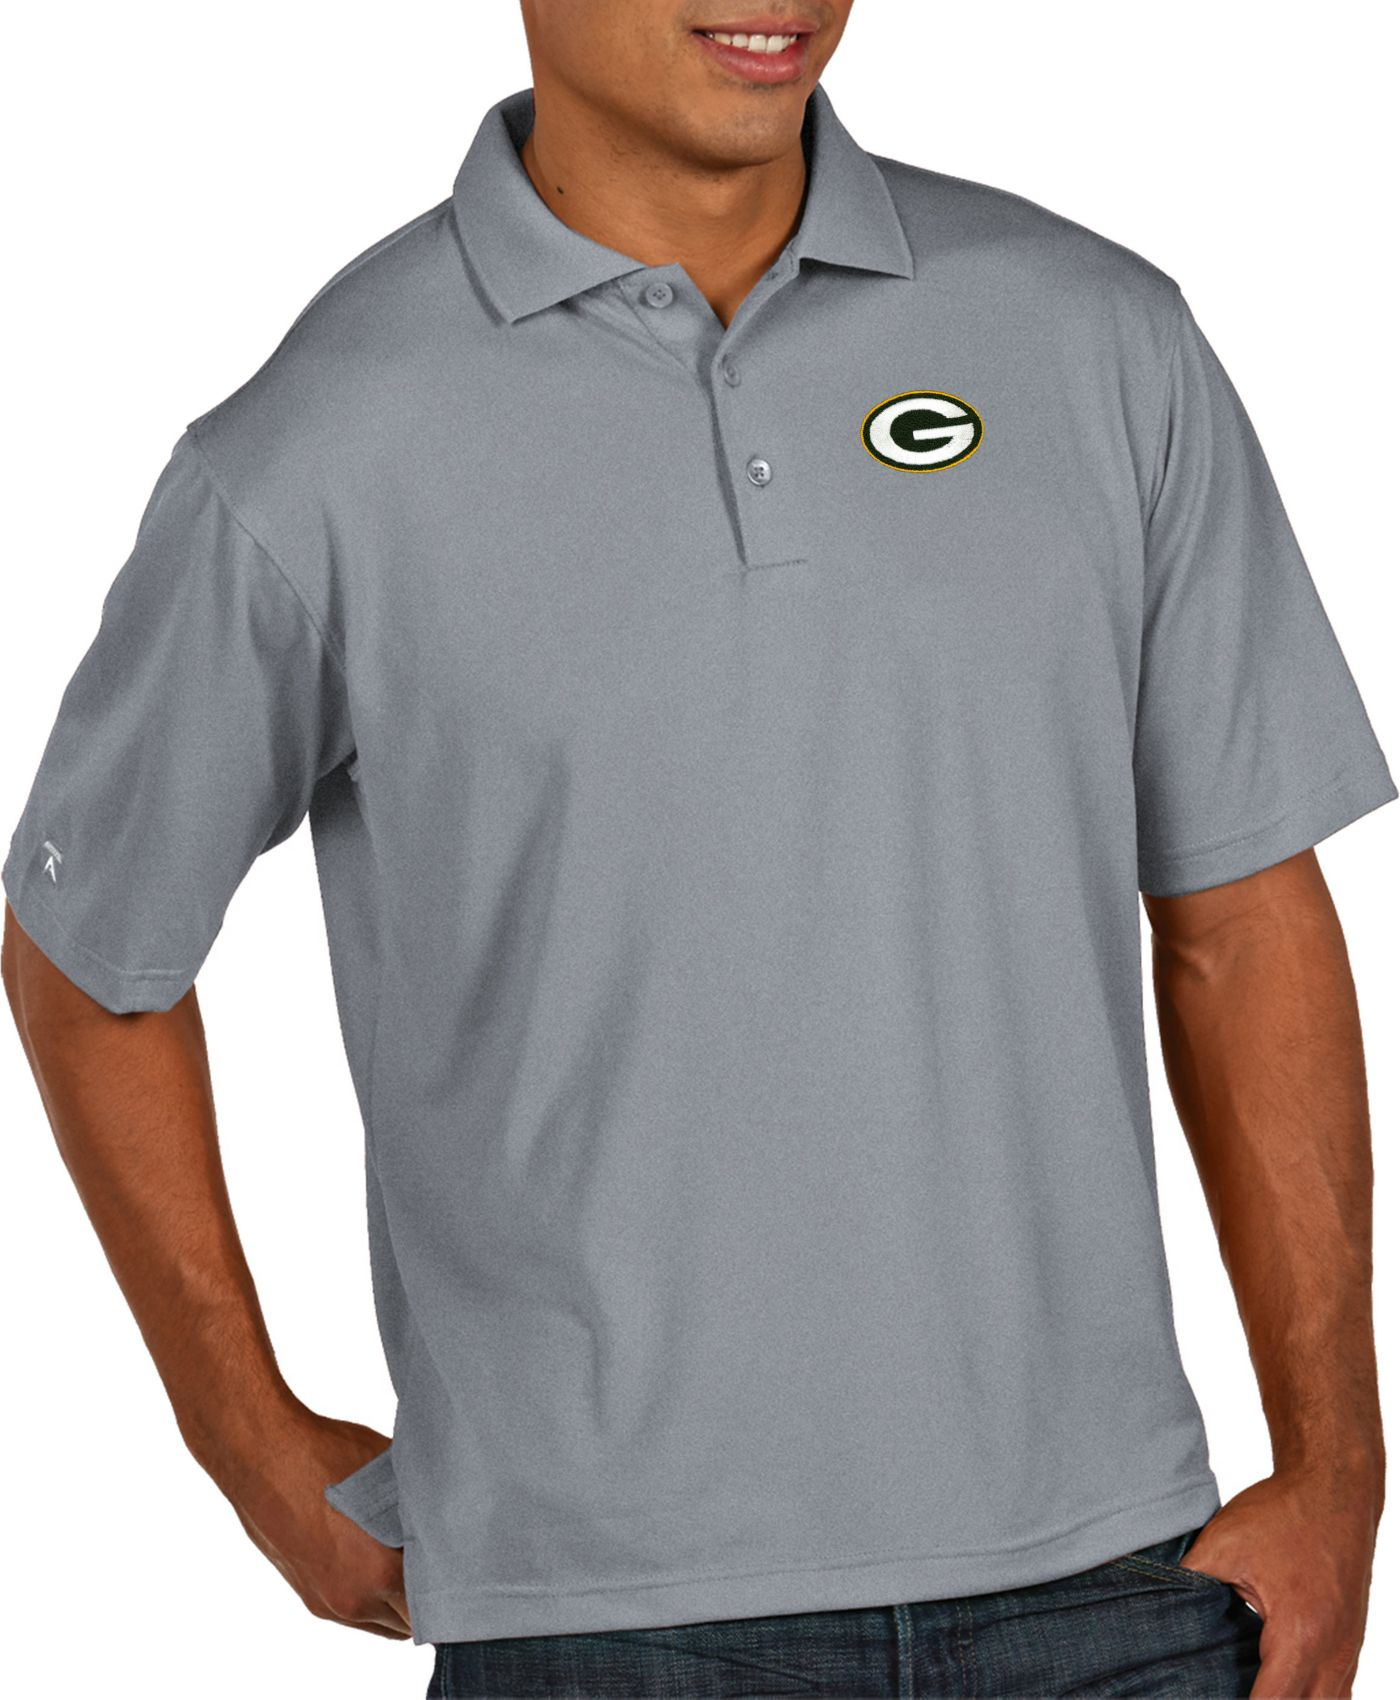 Antigua Men's Green Bay Packers Pique Xtra-Lite Performance Grey Polo